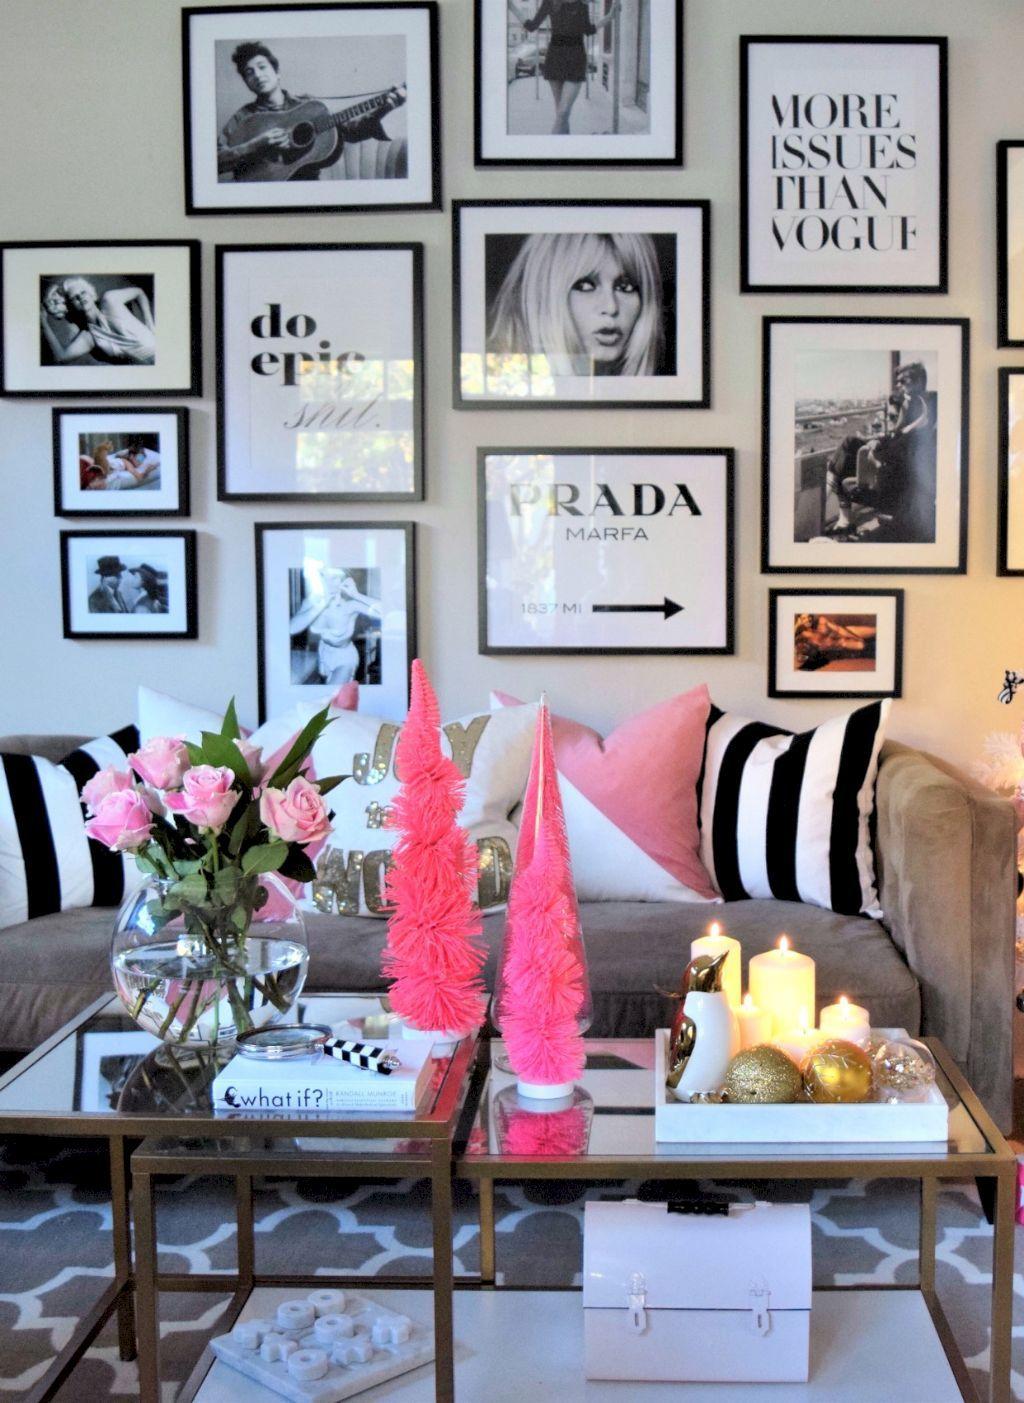 45 Stunning Christmas Living Room Decor Ideas images